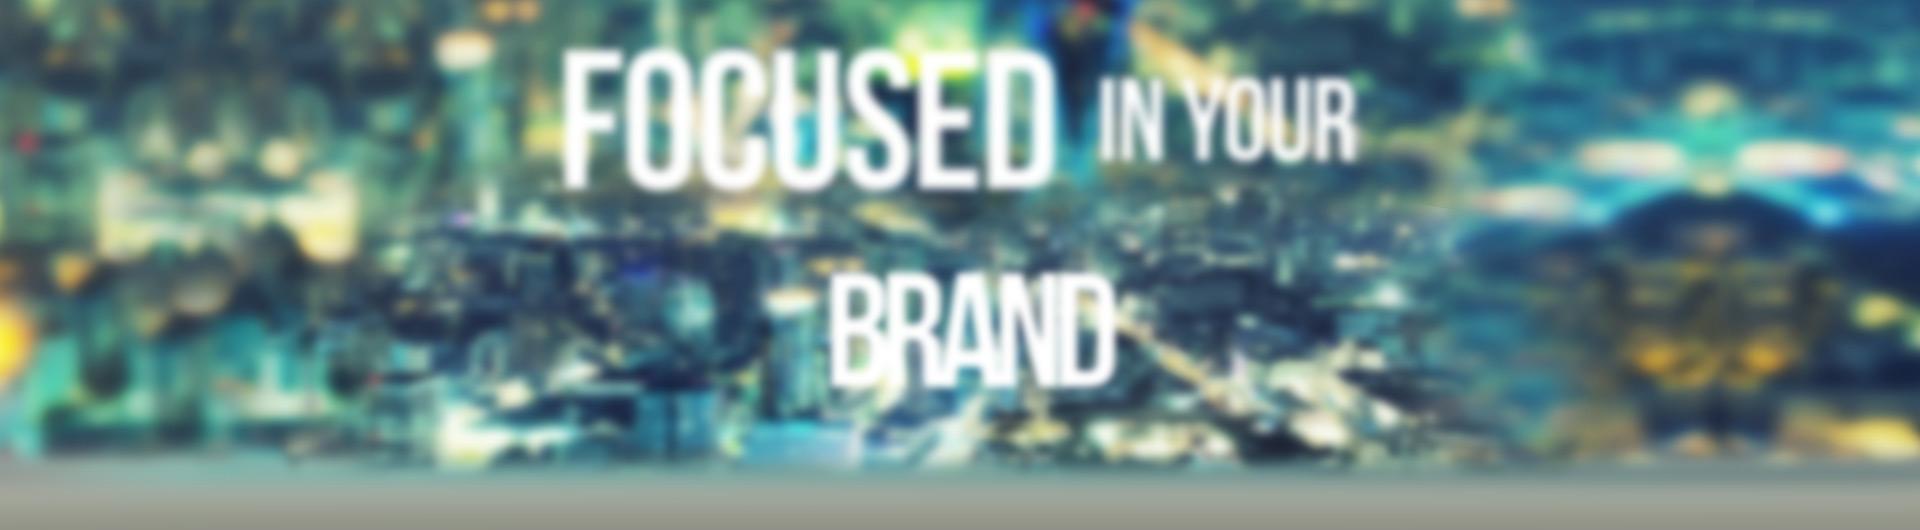 Banner-Focus-Brand